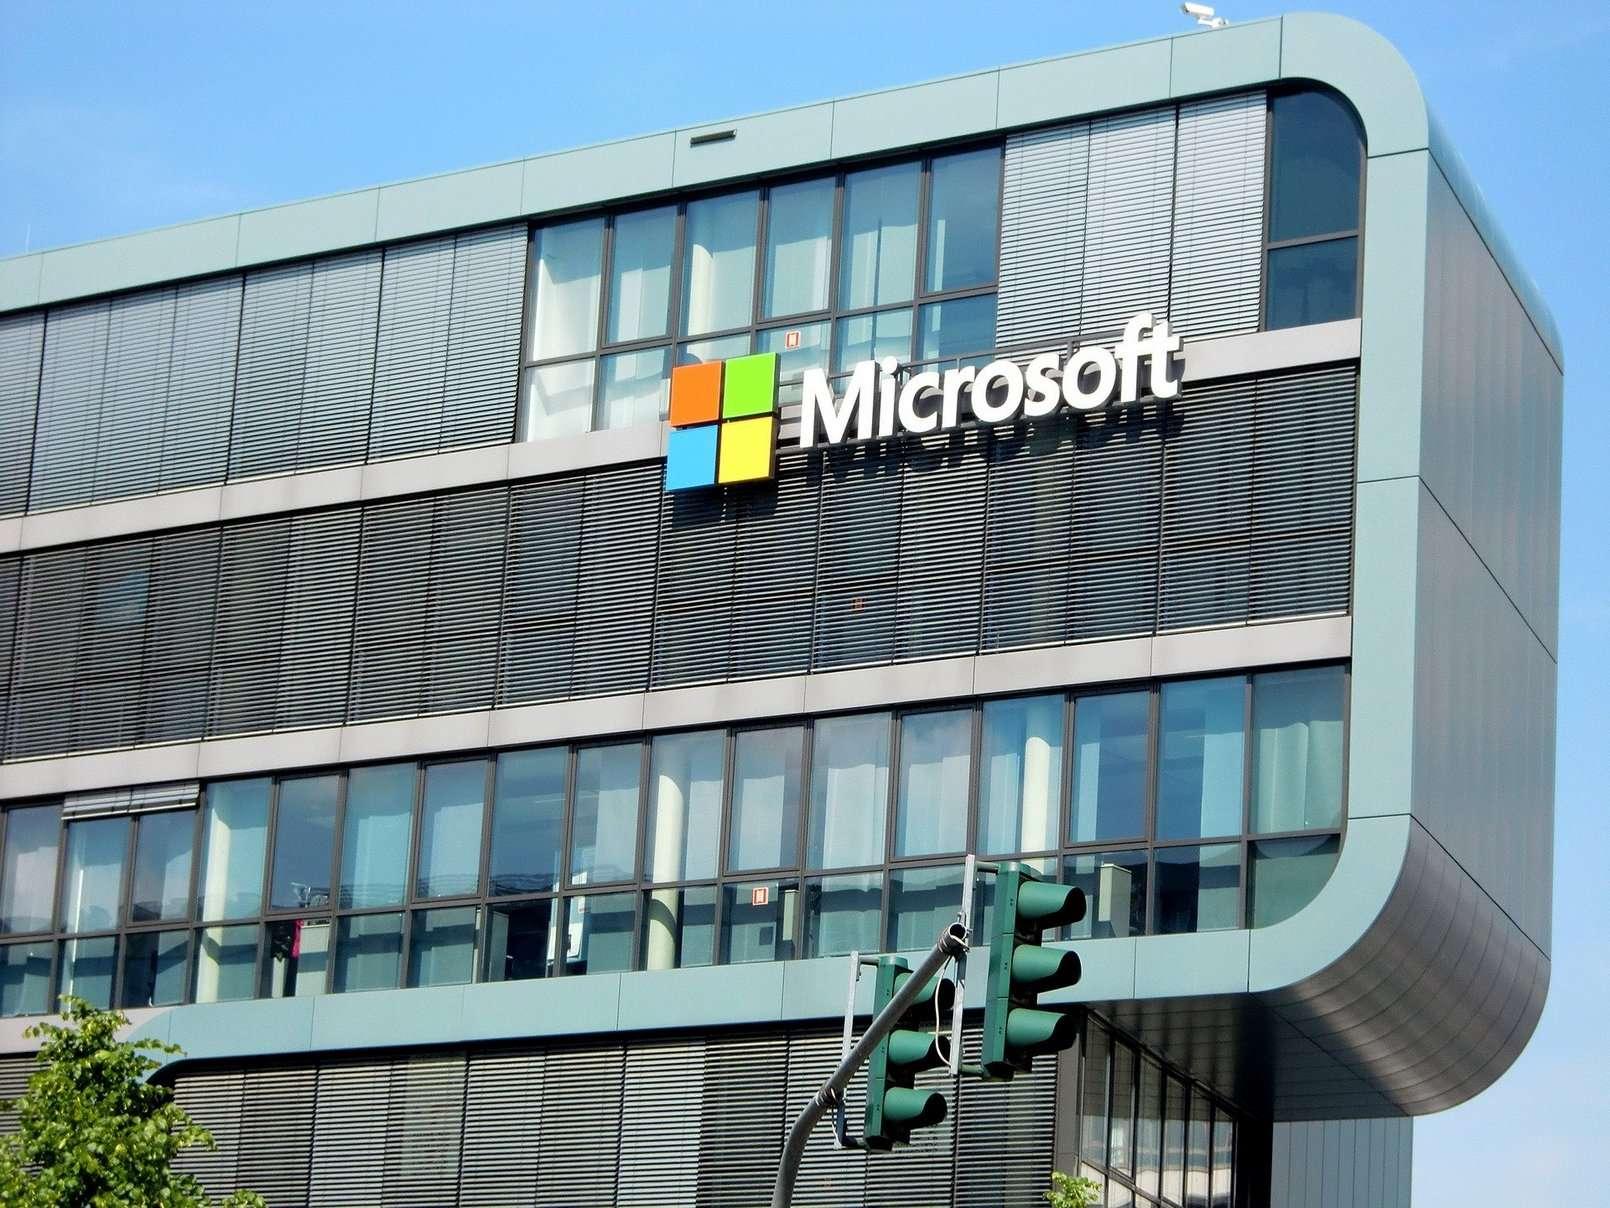 Bilan carbone : Microsoft met la barre très haut